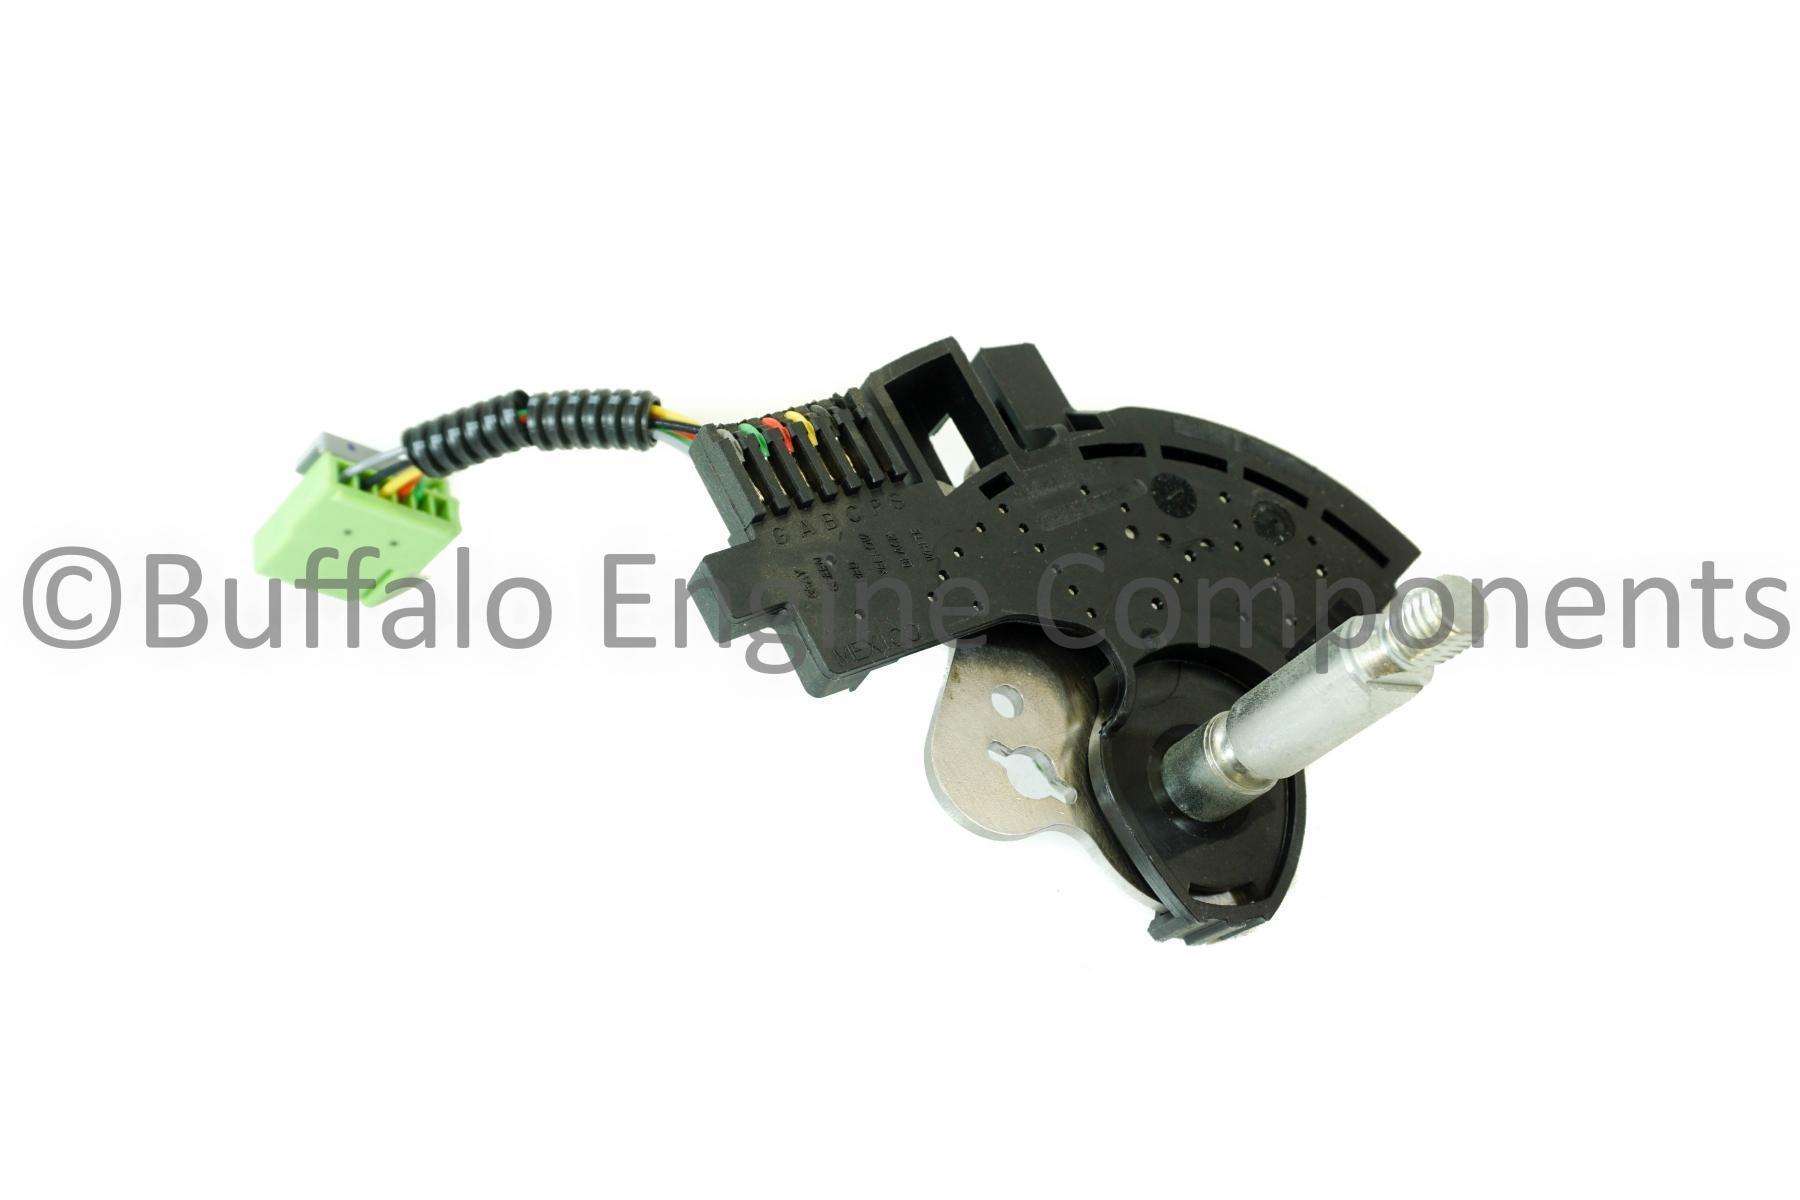 Fits 1988-1991 Honda CRX Fuel Pressure Regulator Standard Motor Products 89432GS